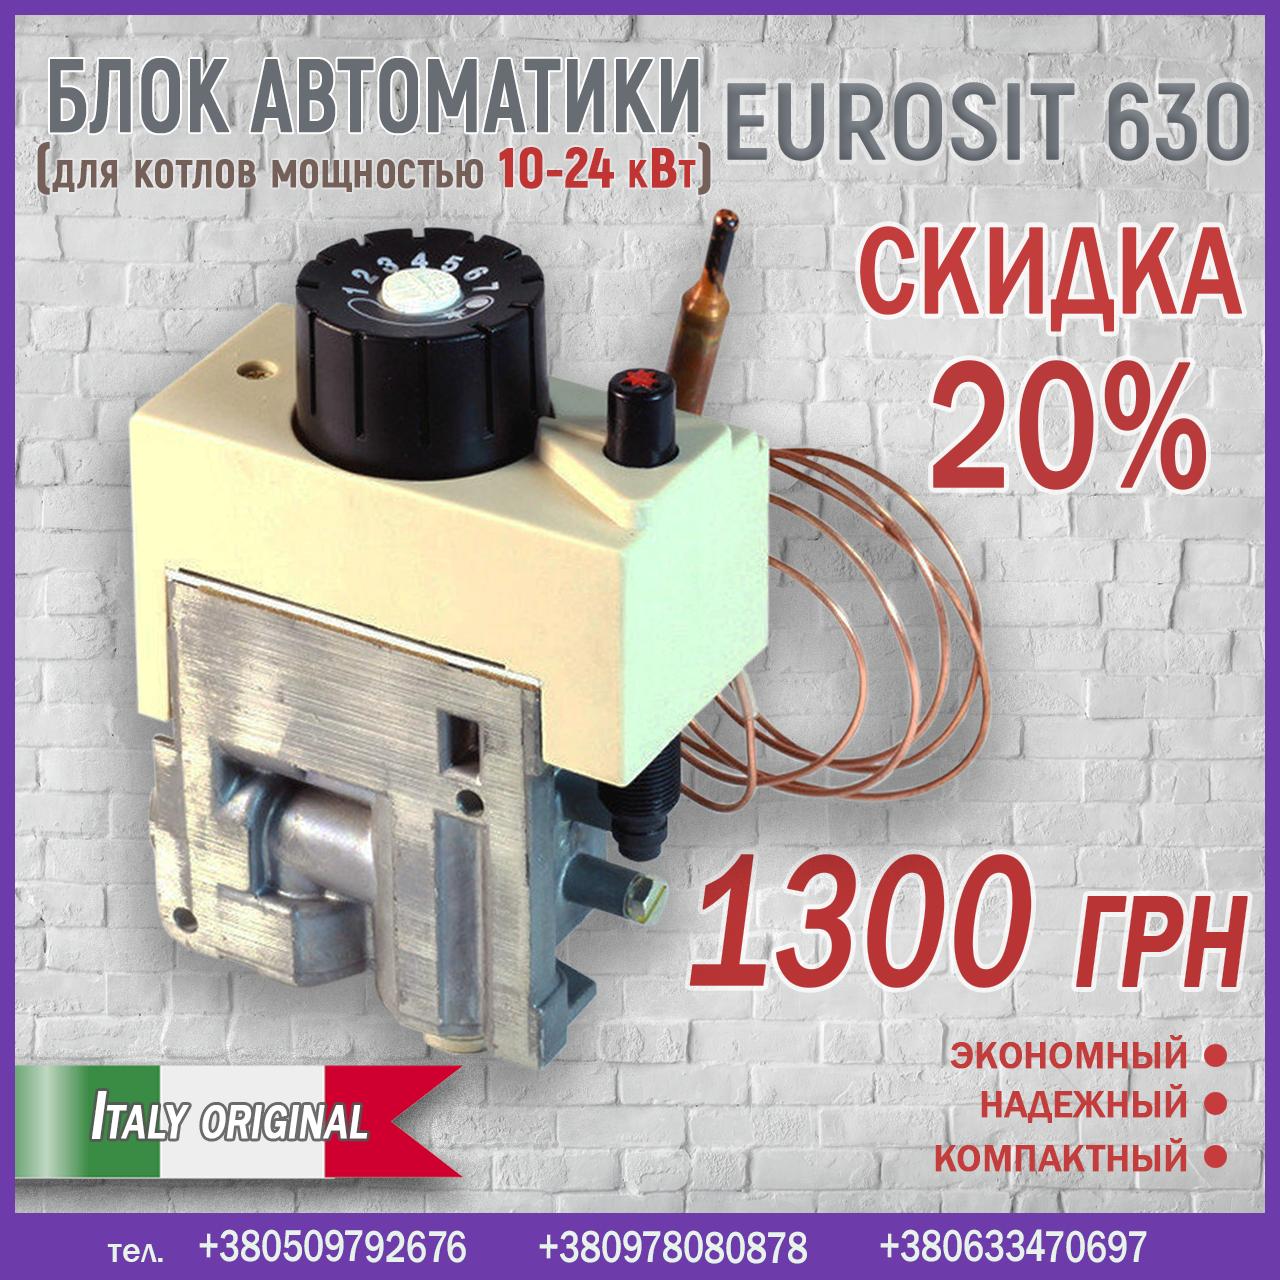 Блок автоматики Eurosit 630 (Италия оригинал)art. 0.630.068 до котлов мощностью 7-20 кВт